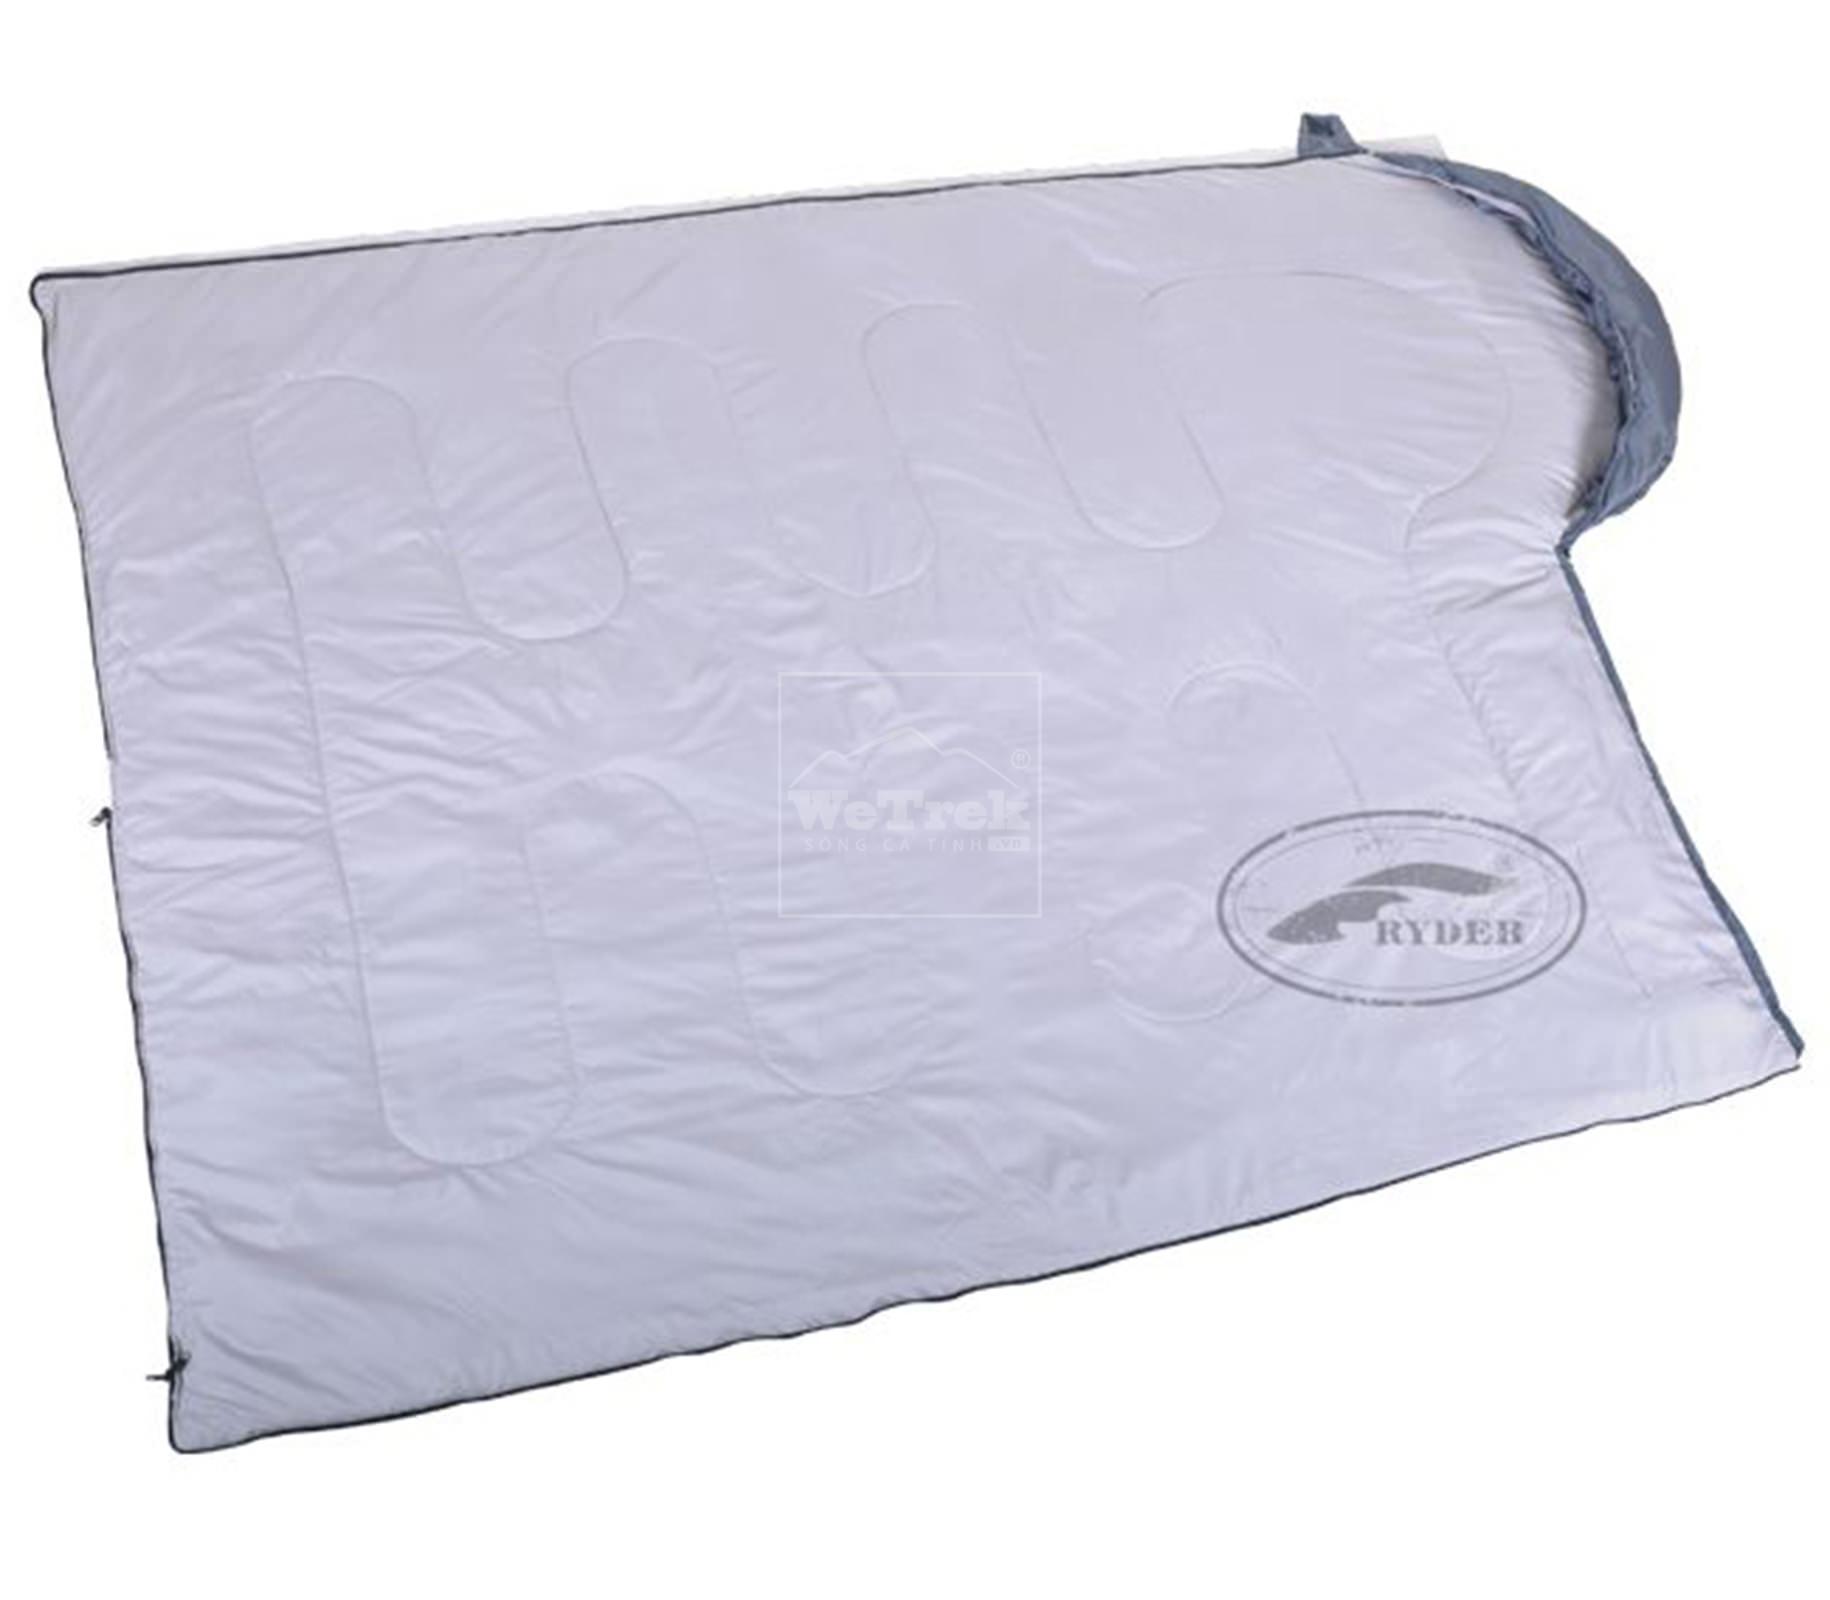 tui-ngu-ryder-envelope-sleeping-bag-d1002-blue-1476-wetrek.vn-1